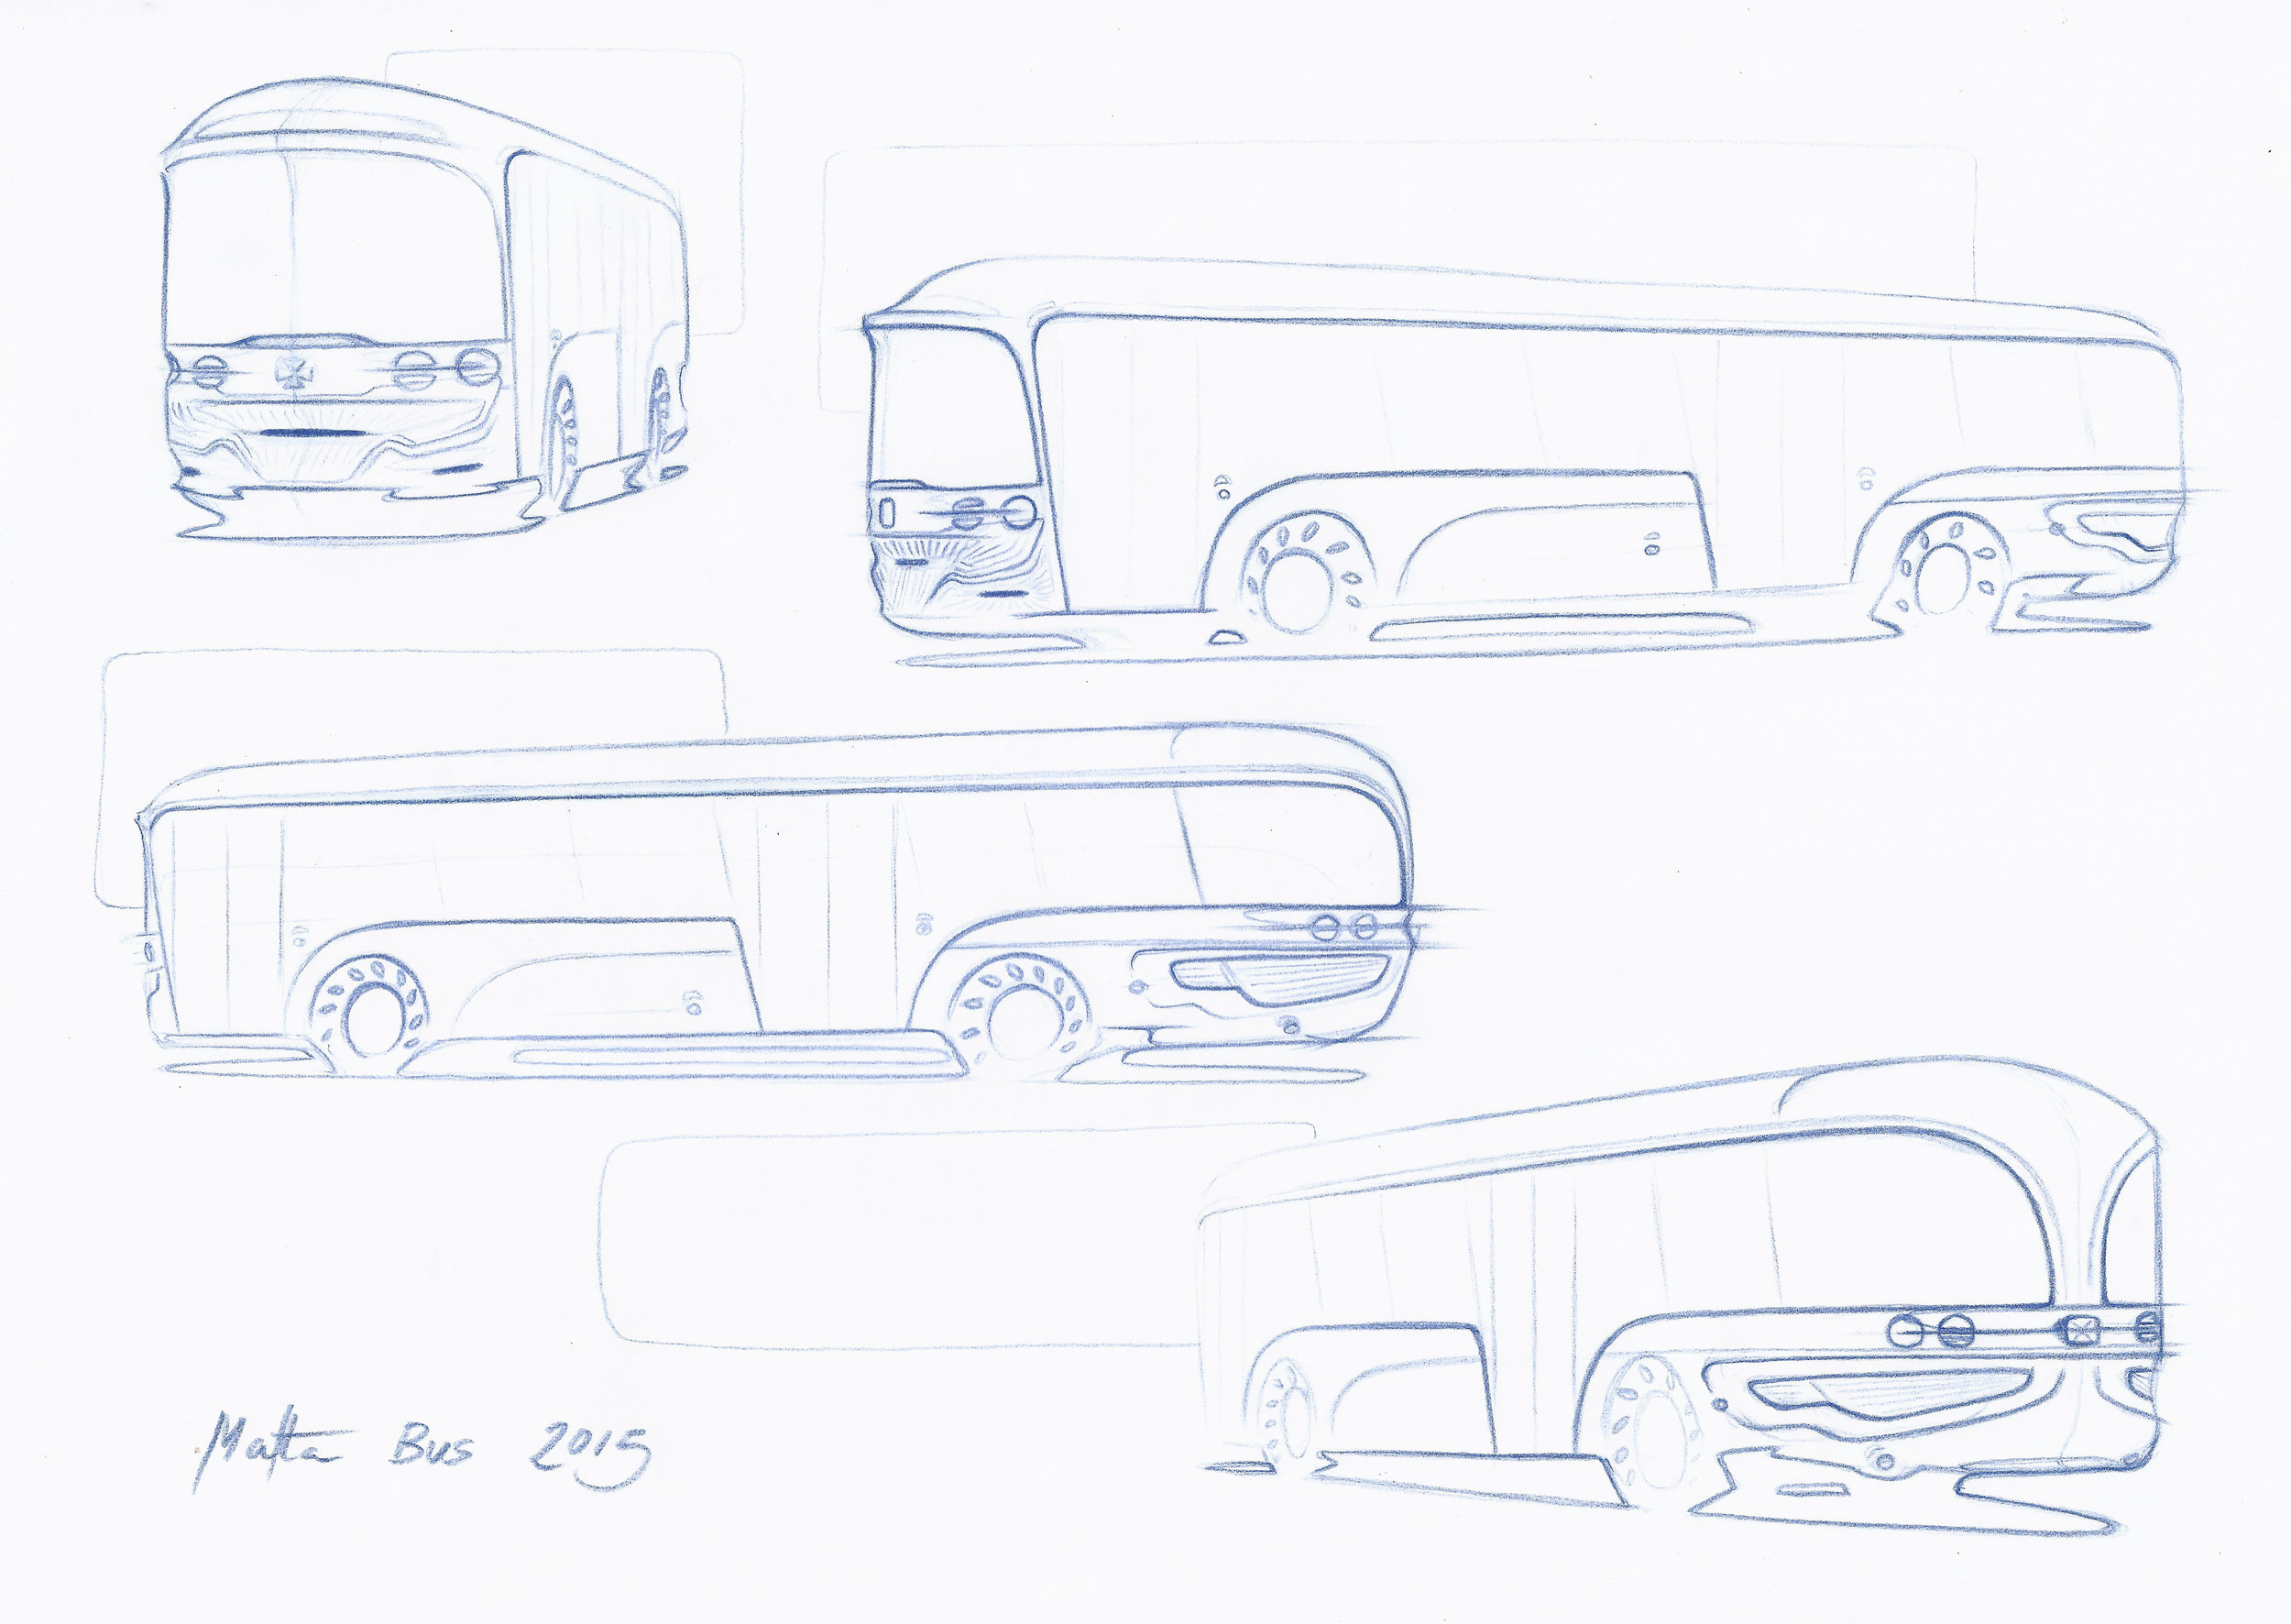 Sketch_02_Mizzi Studio_Malta Bus Reborn.jpg